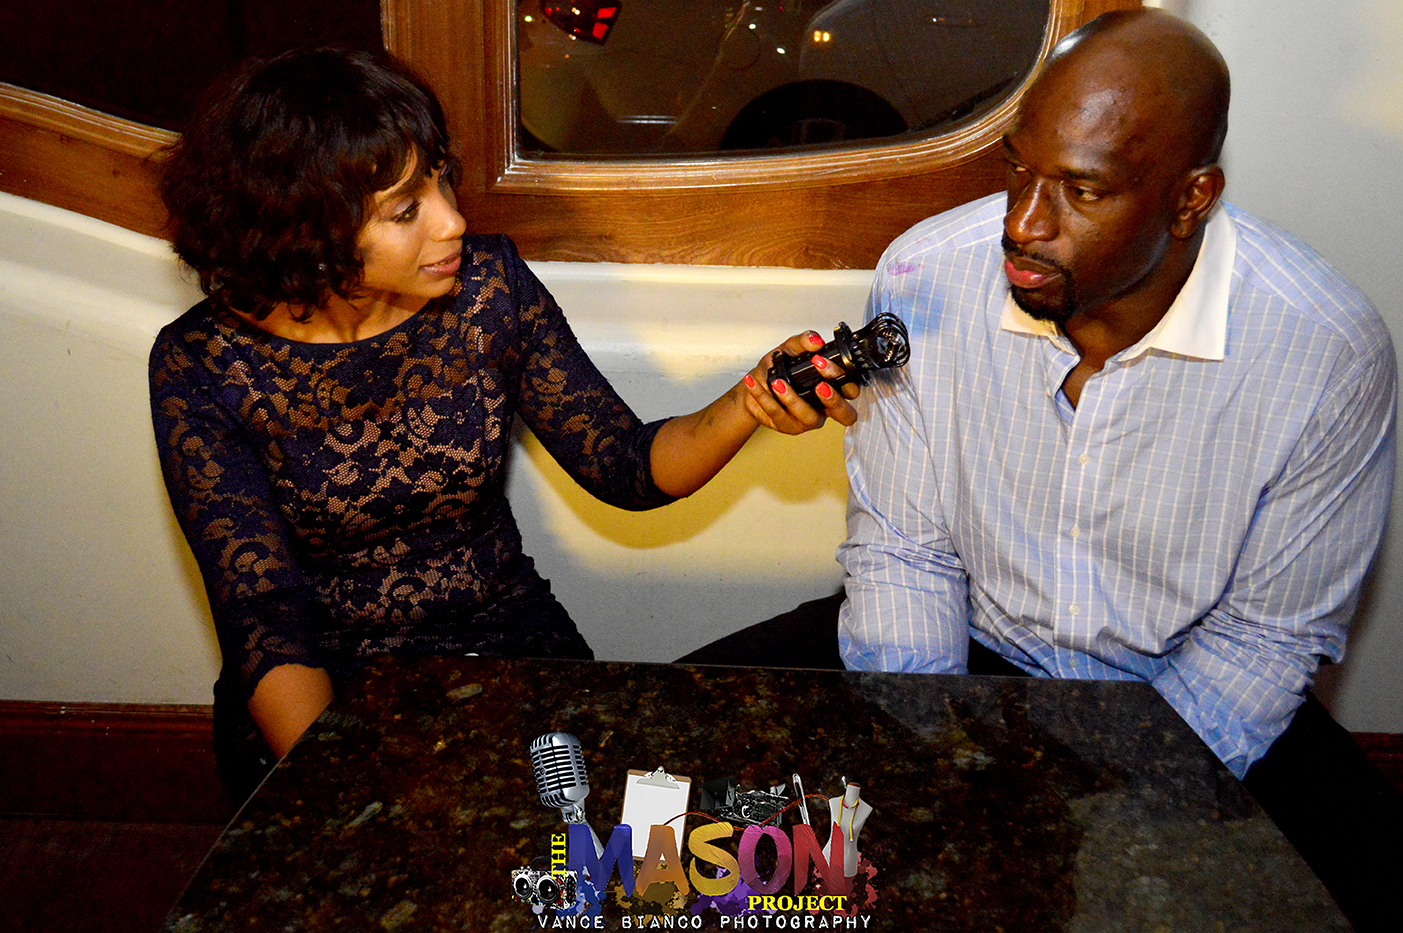 Reel Rose Interviewint Titus Oneal